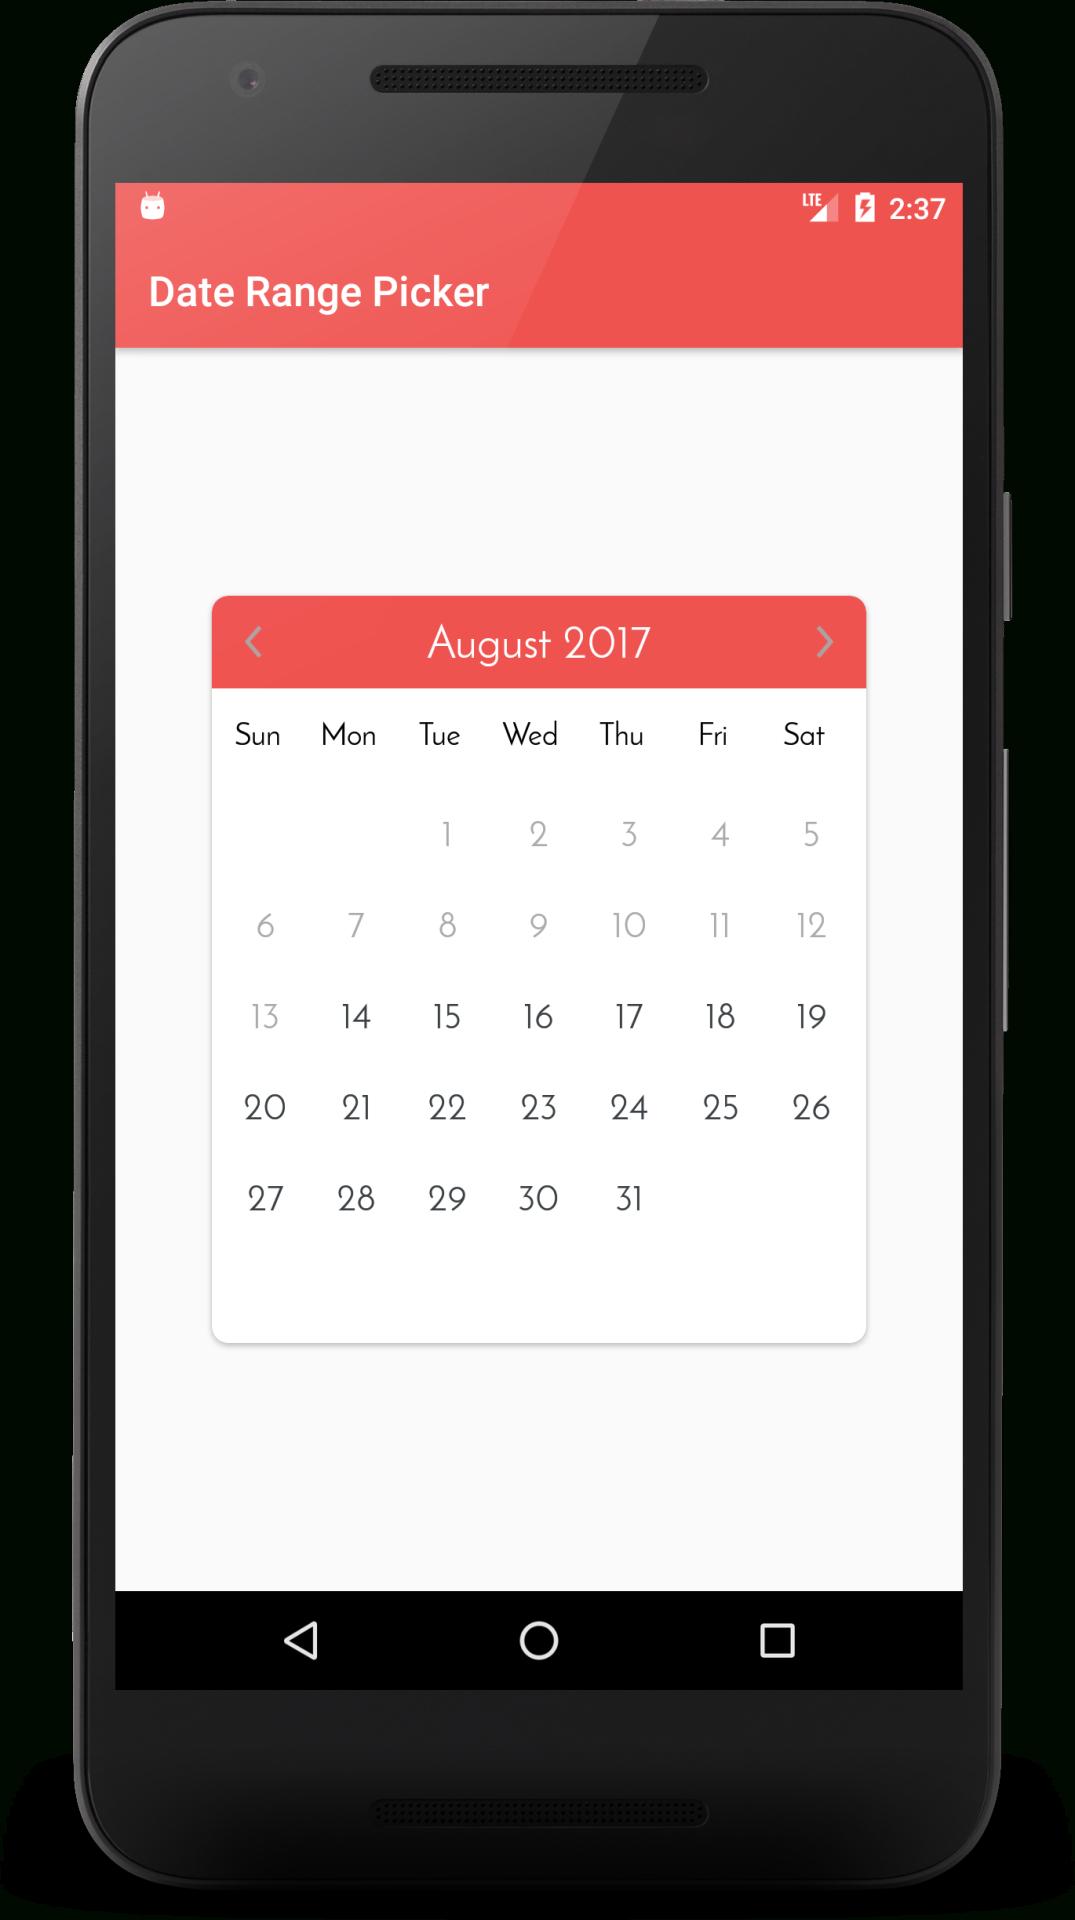 Android Arsenal — Calendar Date Range Picker with Android Arsenal Calendar